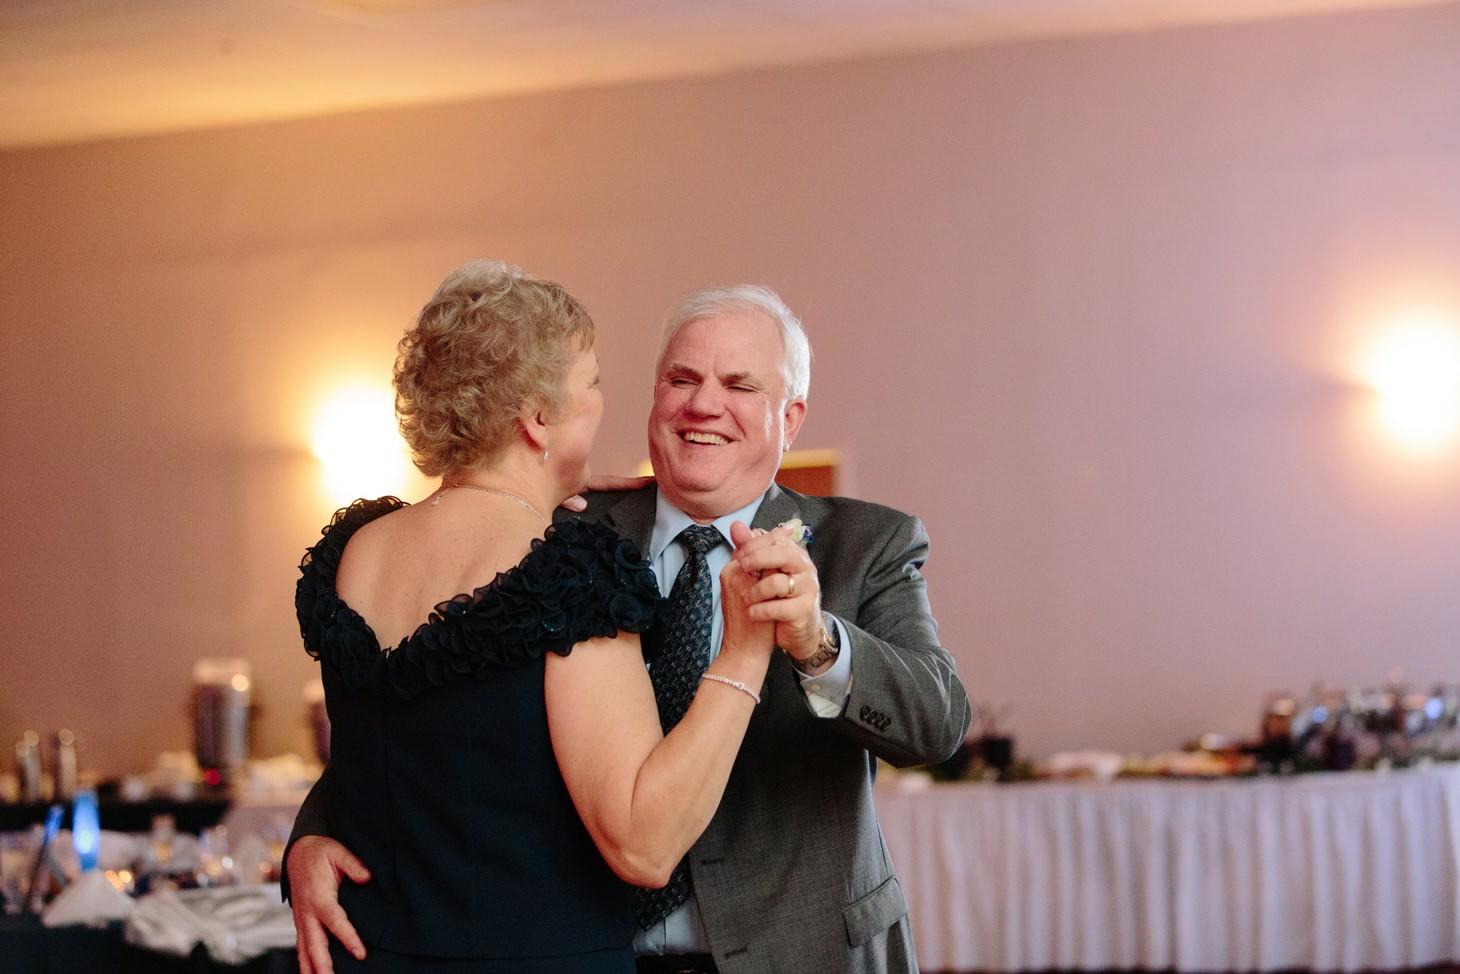 037-nyc-wedding-photographer-nj-nerdy-dr-who-firehouse-wedding-smitten-chickens.jpg